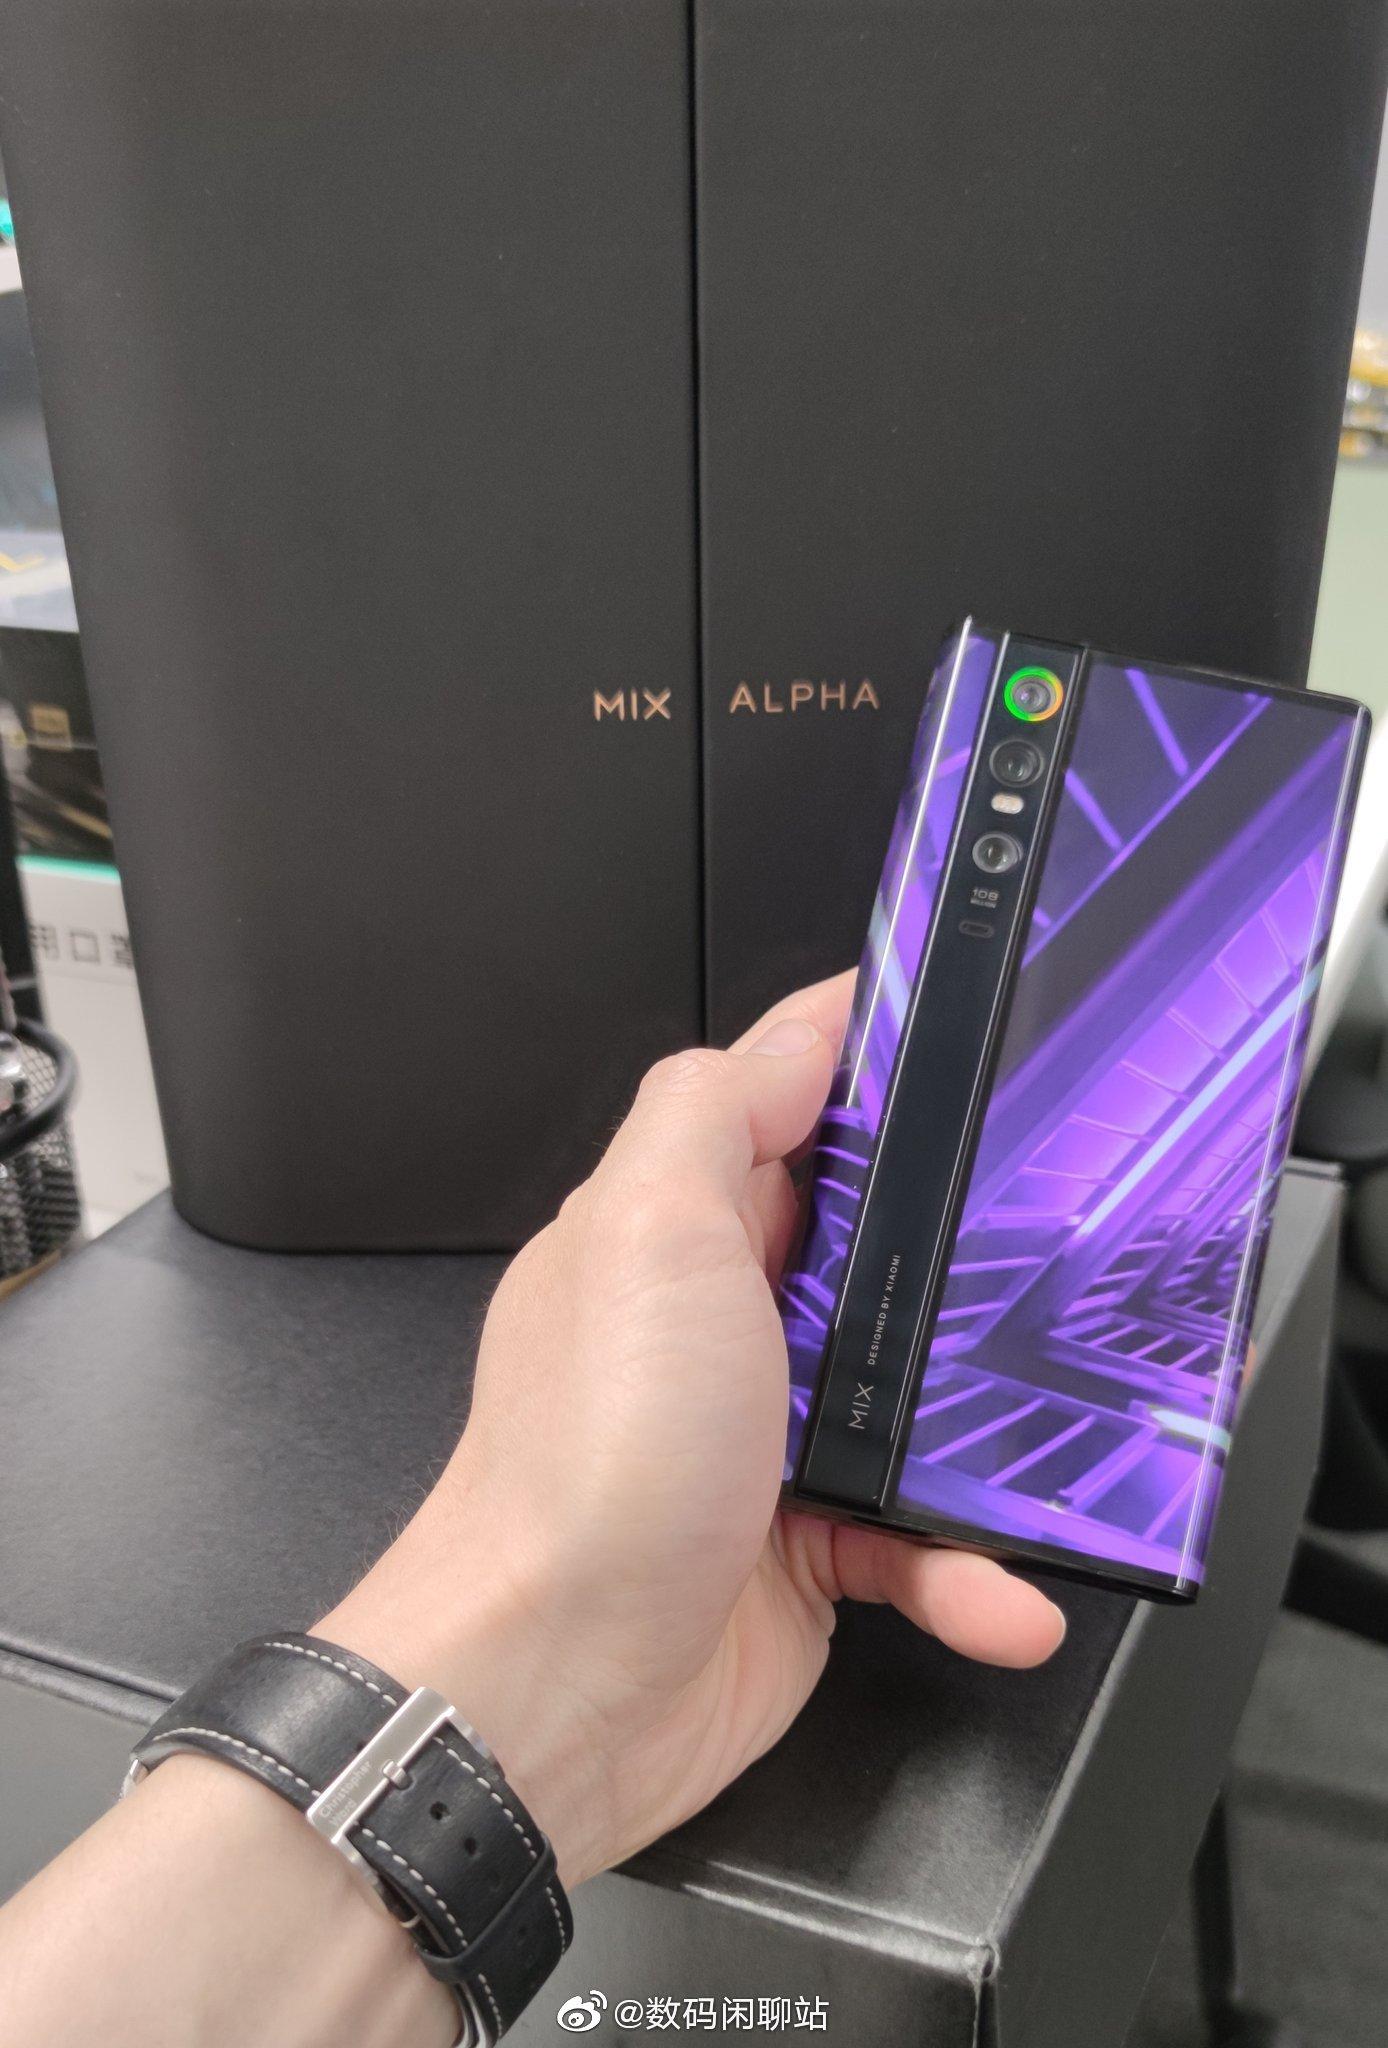 Концептофон Xiaomi Mi MIX Alpha так и не вышел в свет Xiaomi  - xiaomi_mi_mix_alpha_vse_konceptofon_tak_i_ne_dobralsa_do_prilavkov_picture2_0